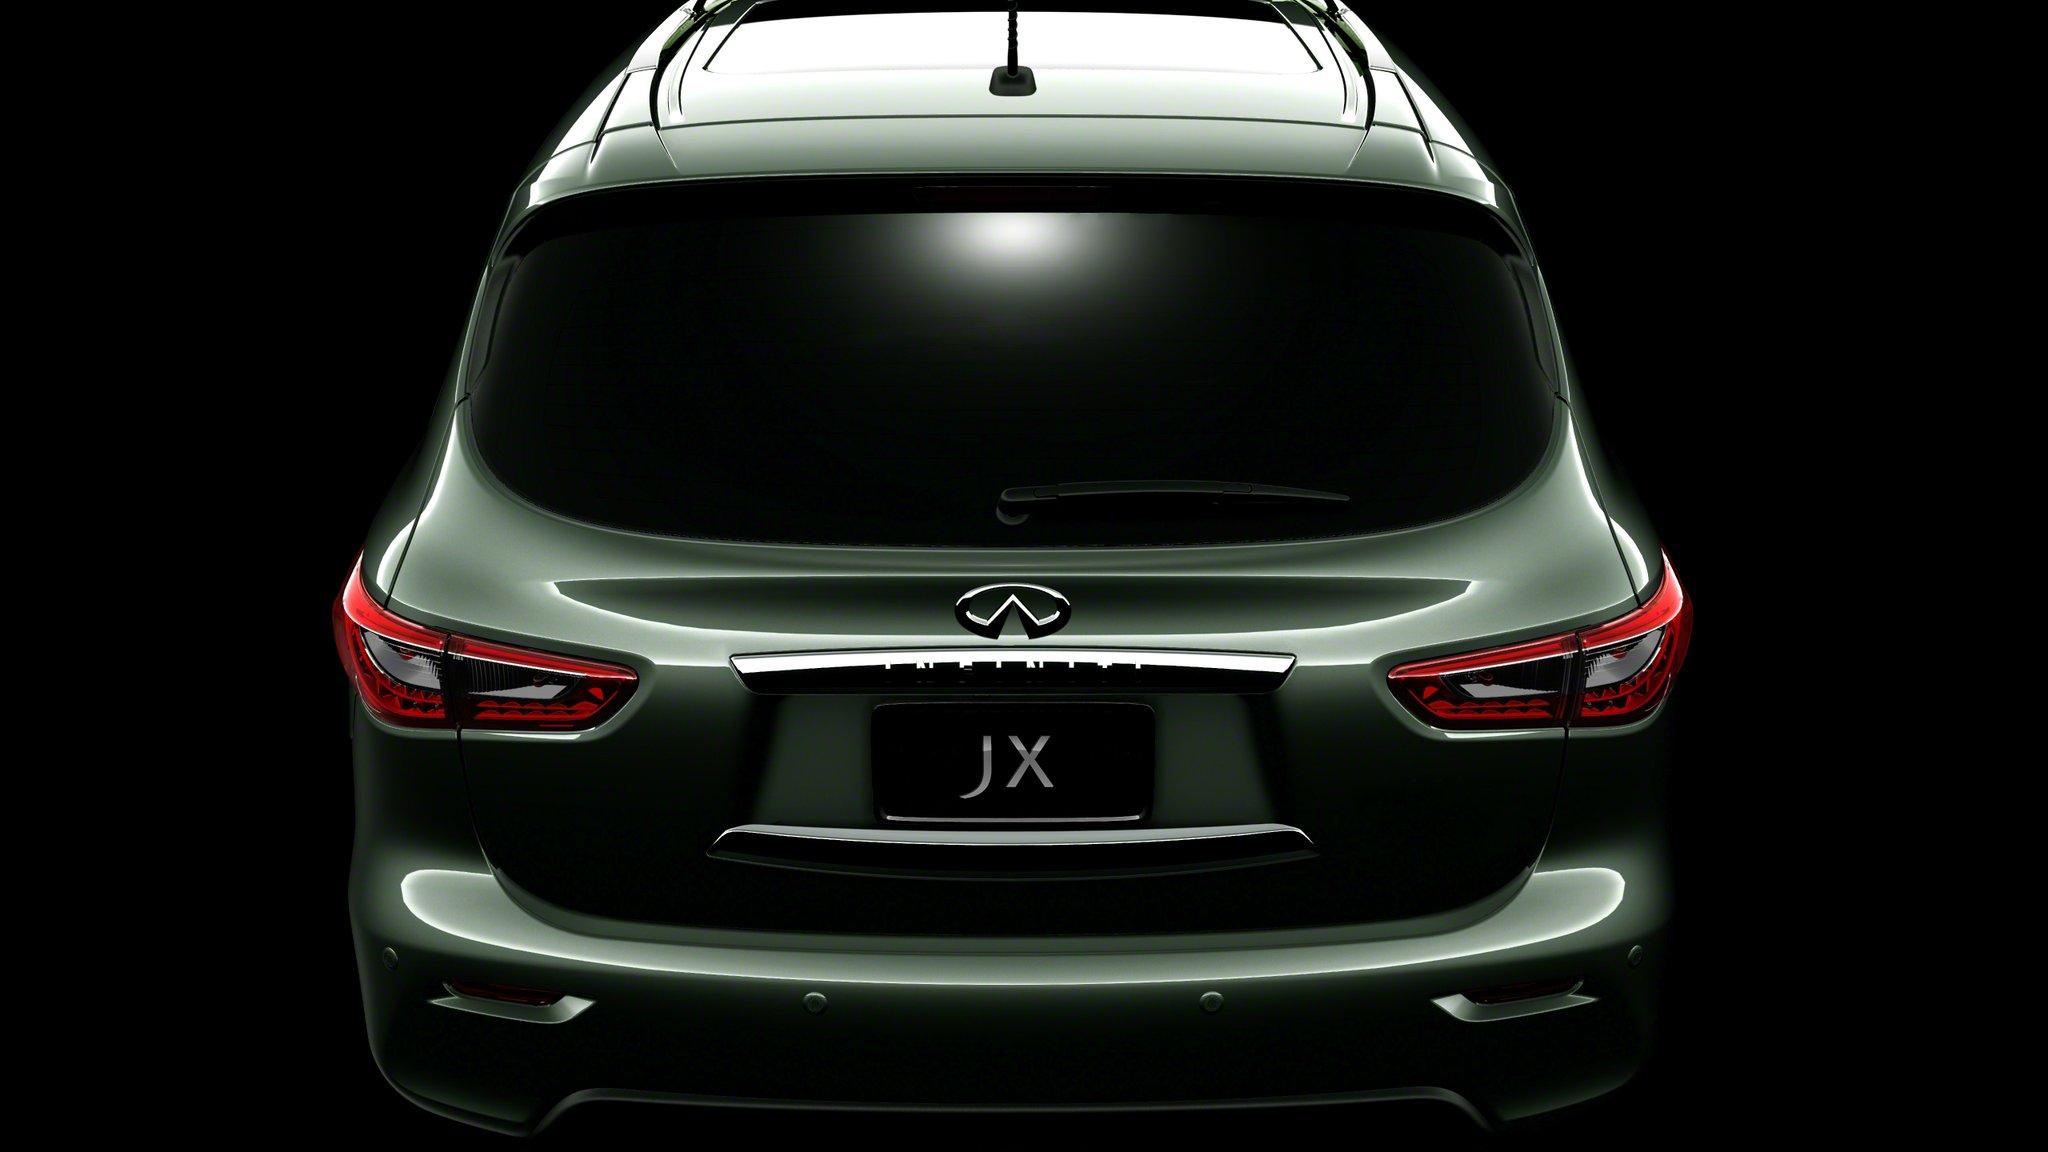 5th Infiniti JX Teaser Image Reveals Rear-End